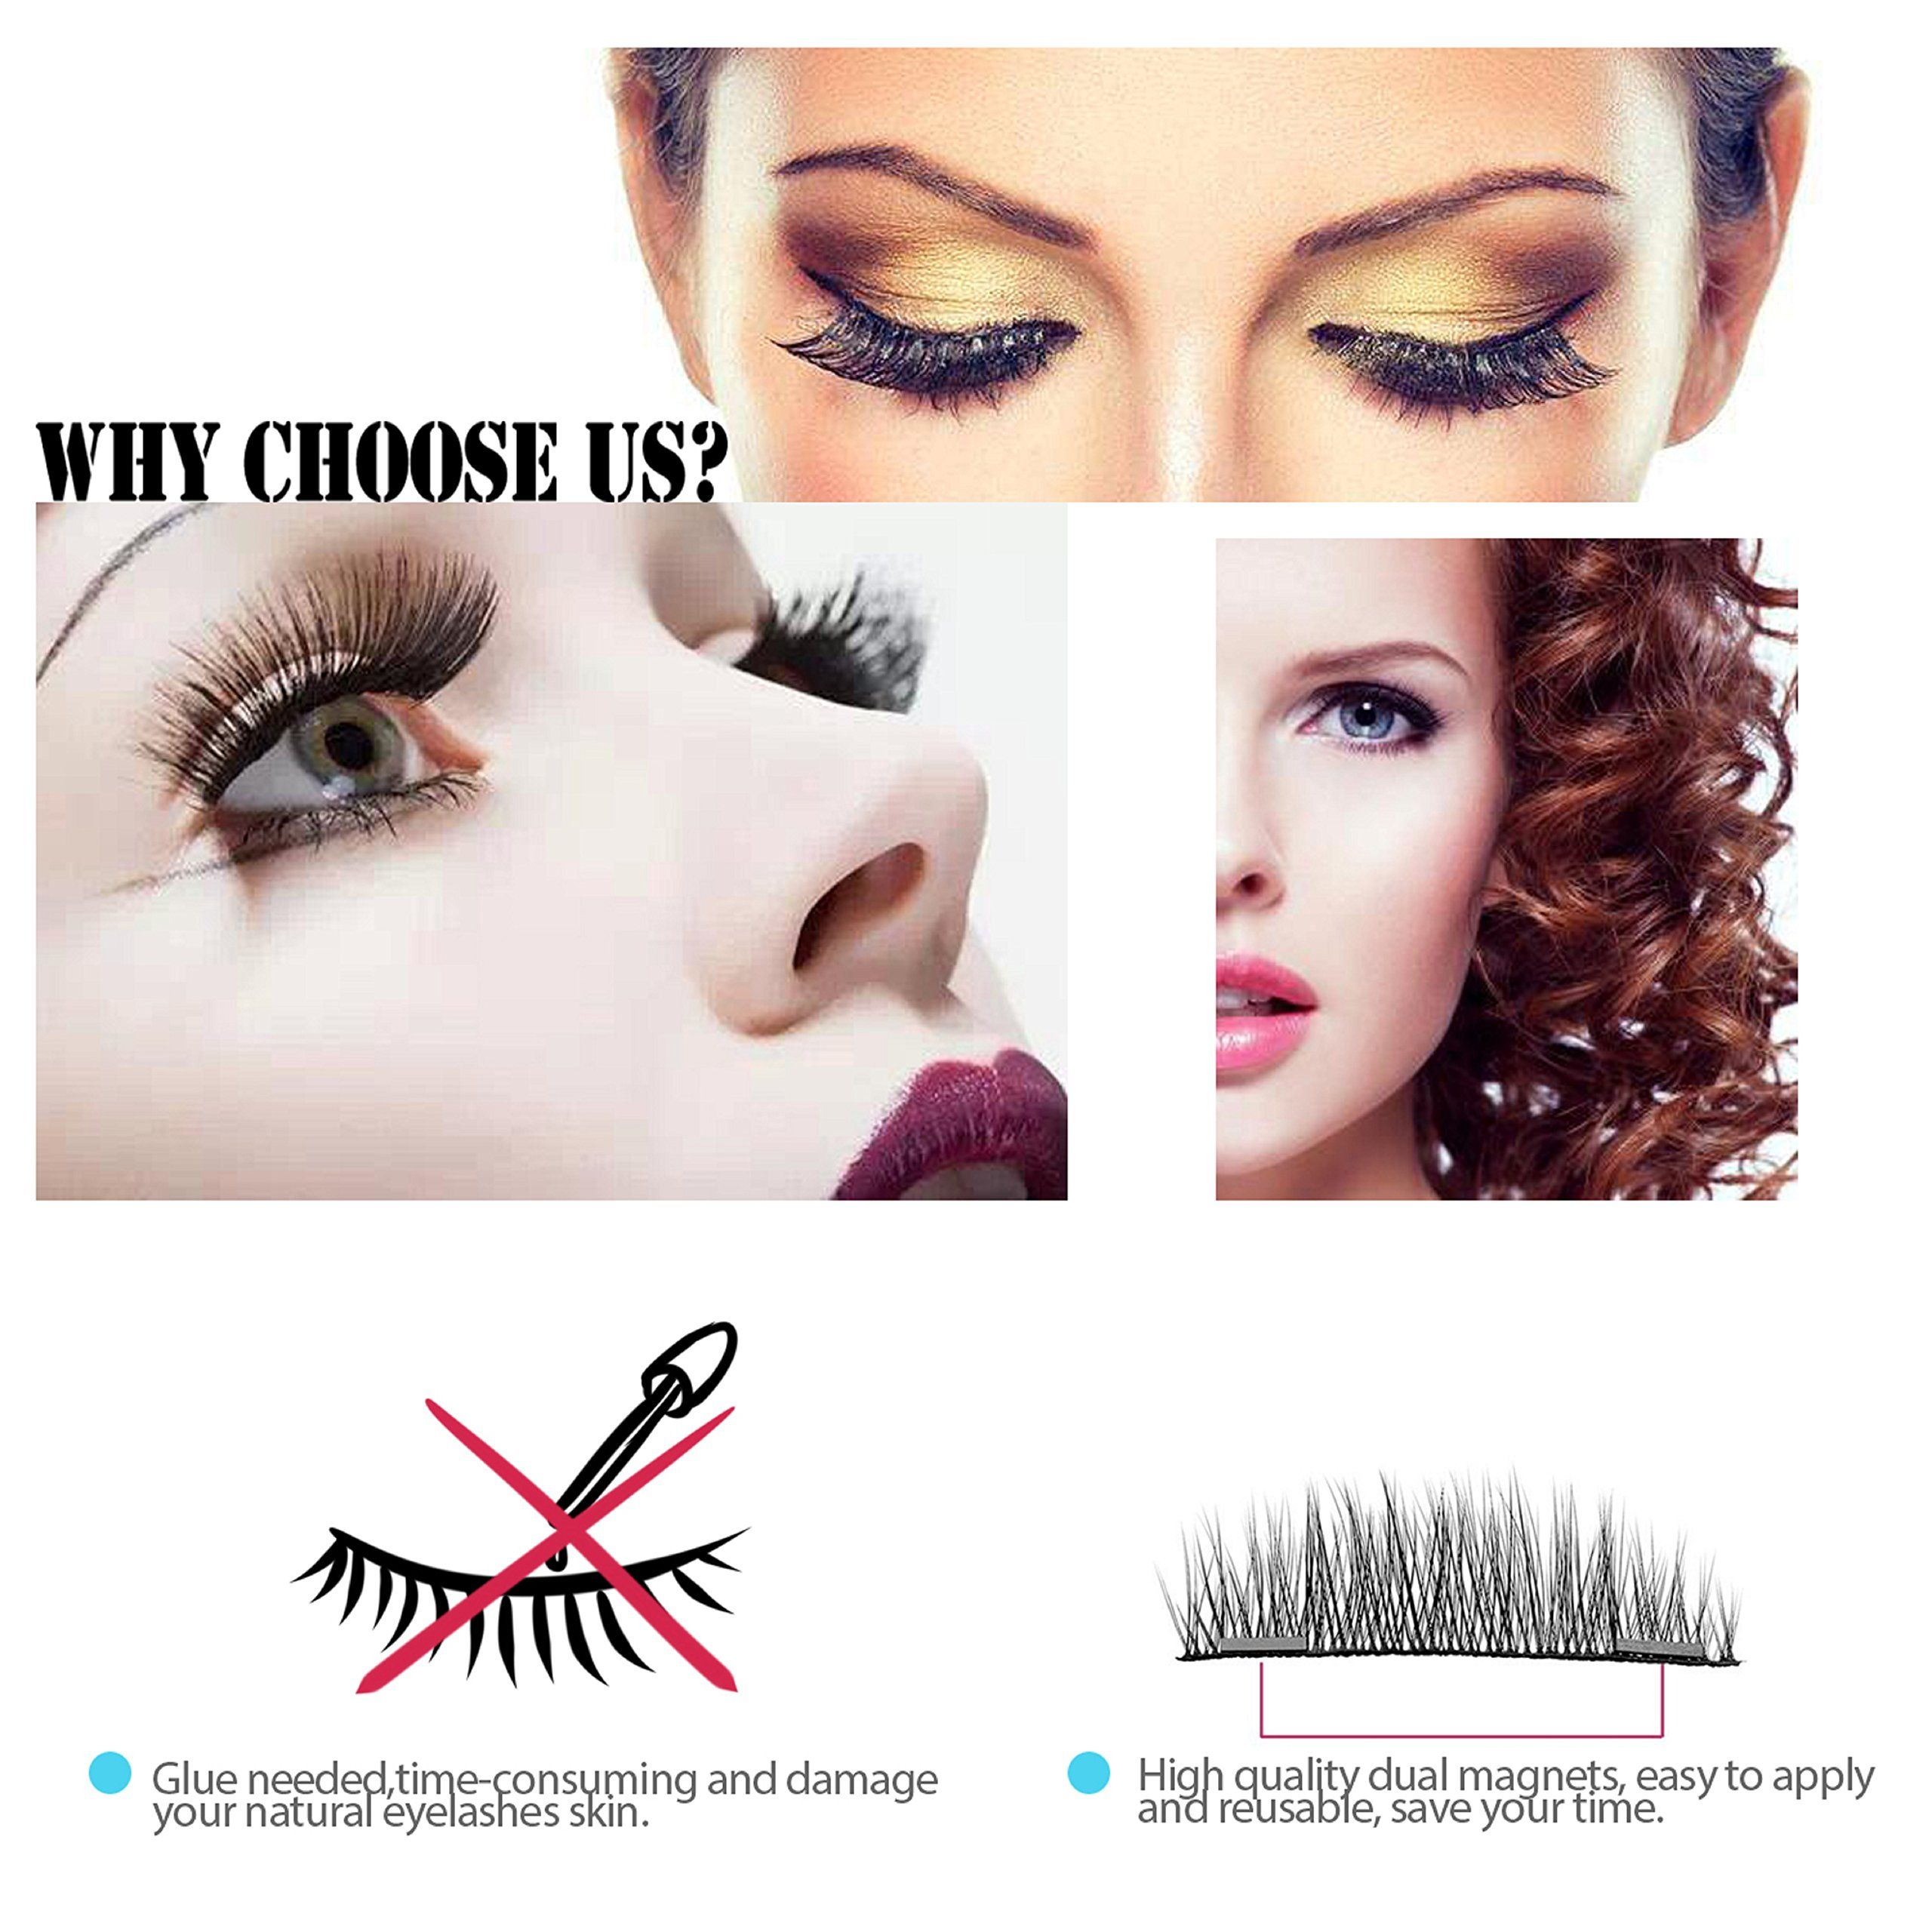 6b60a57c792 Verfanny Magnetic Eyelashes No Glue 3D Reusable False Eyelashes Set for  Natural Look Best Fake Lashes